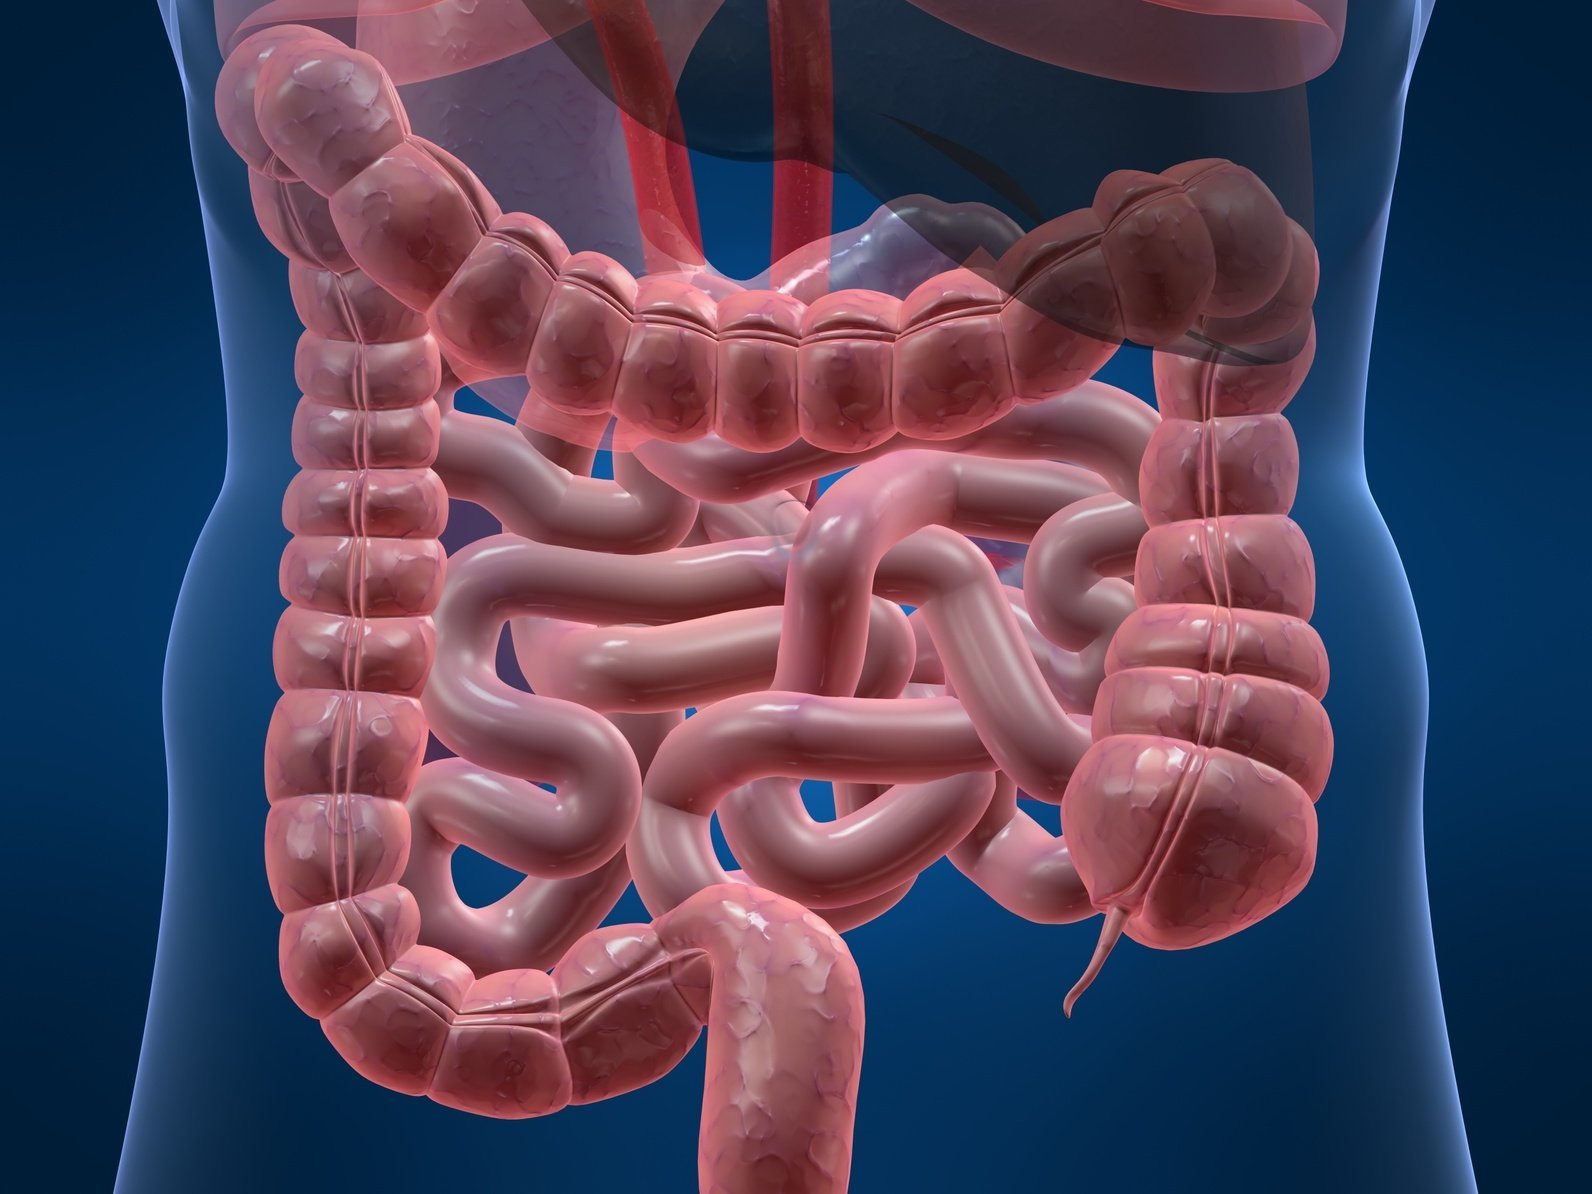 Что такое жкт , лечение и профилактика жкт